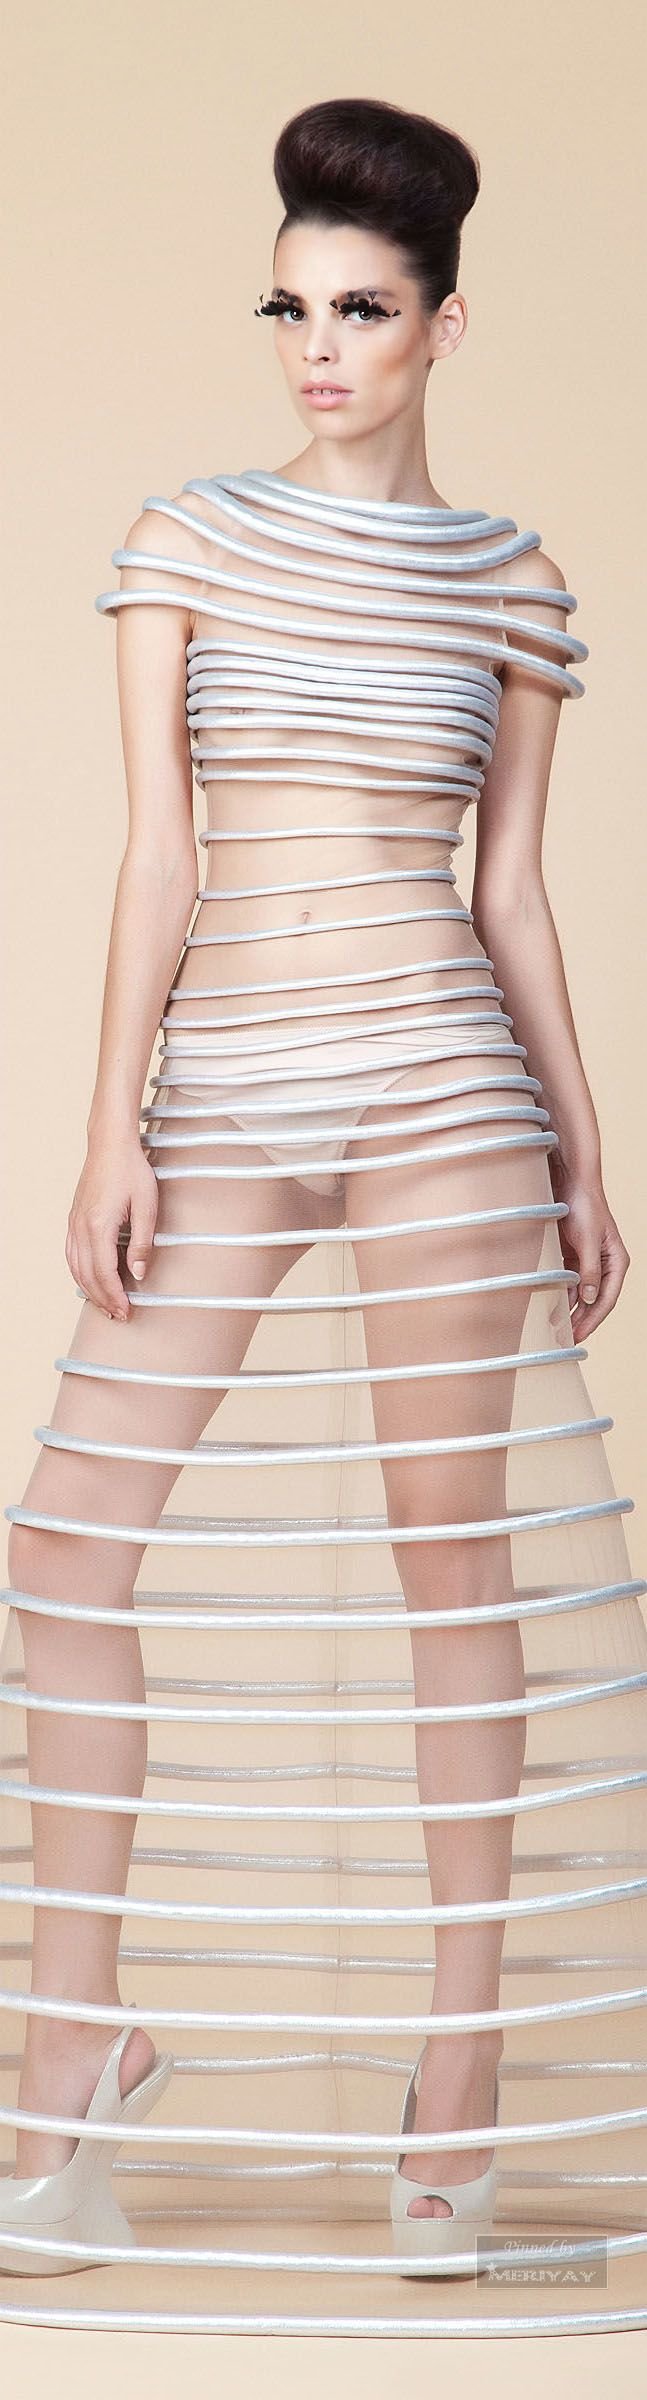 Jean Louis Sabaji Sheer Hoop Skirt Dress  Futuristic Fashion #UNIQUE_WOMENS_FASHION